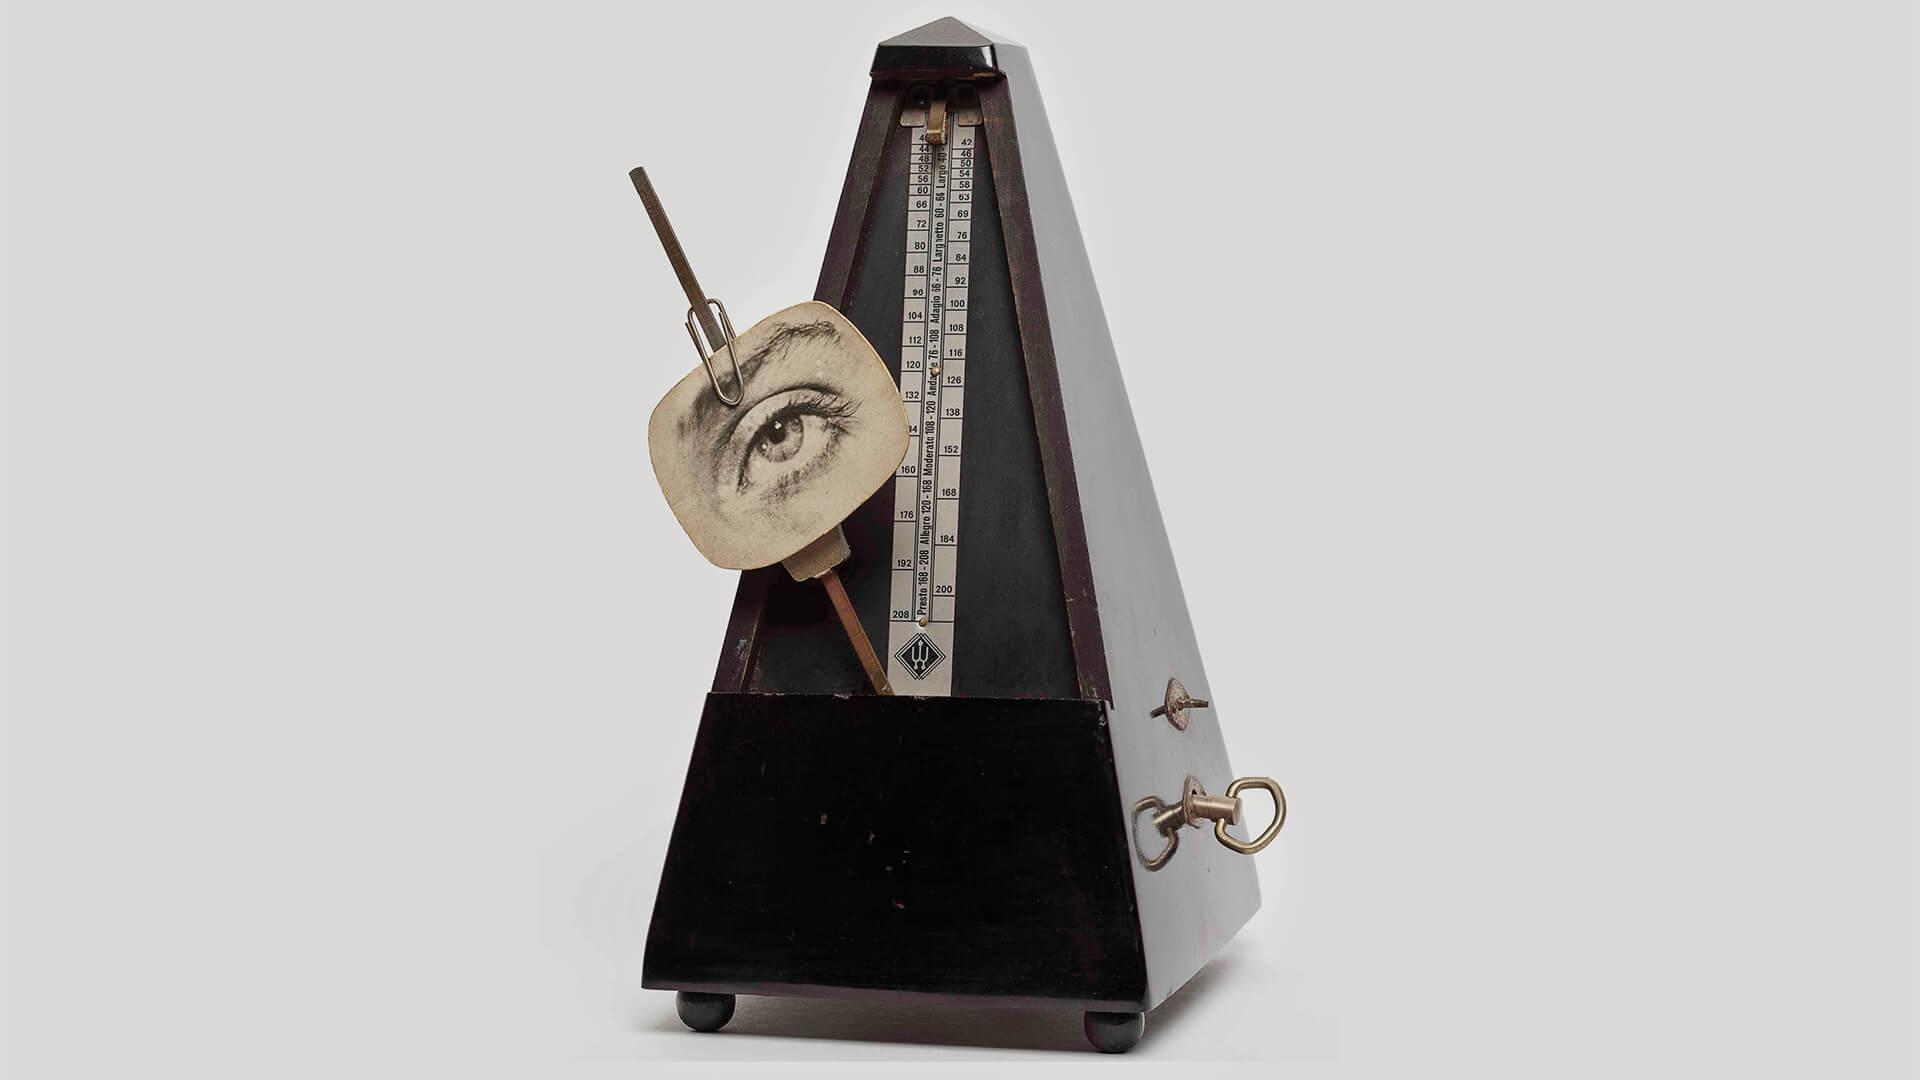 An installation by Man Ray at Disonata | Disonata | Man Ray | STIRworld